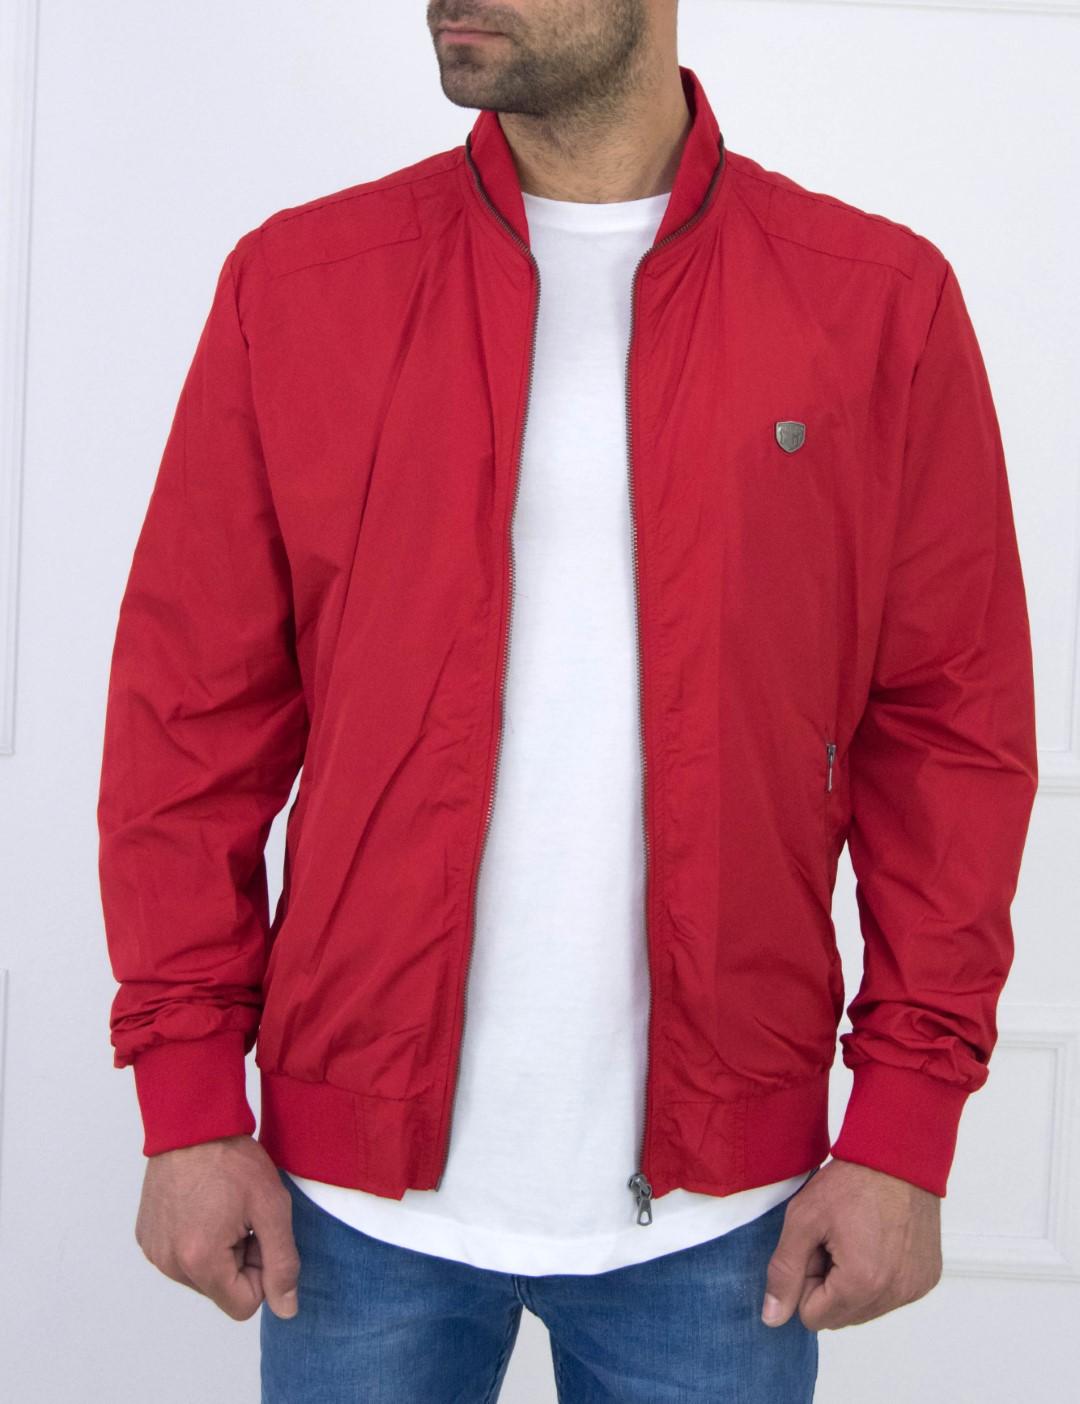 01050255ad Aνδρικό κόκκινο Fly Jacket τσέπες Inox 15400